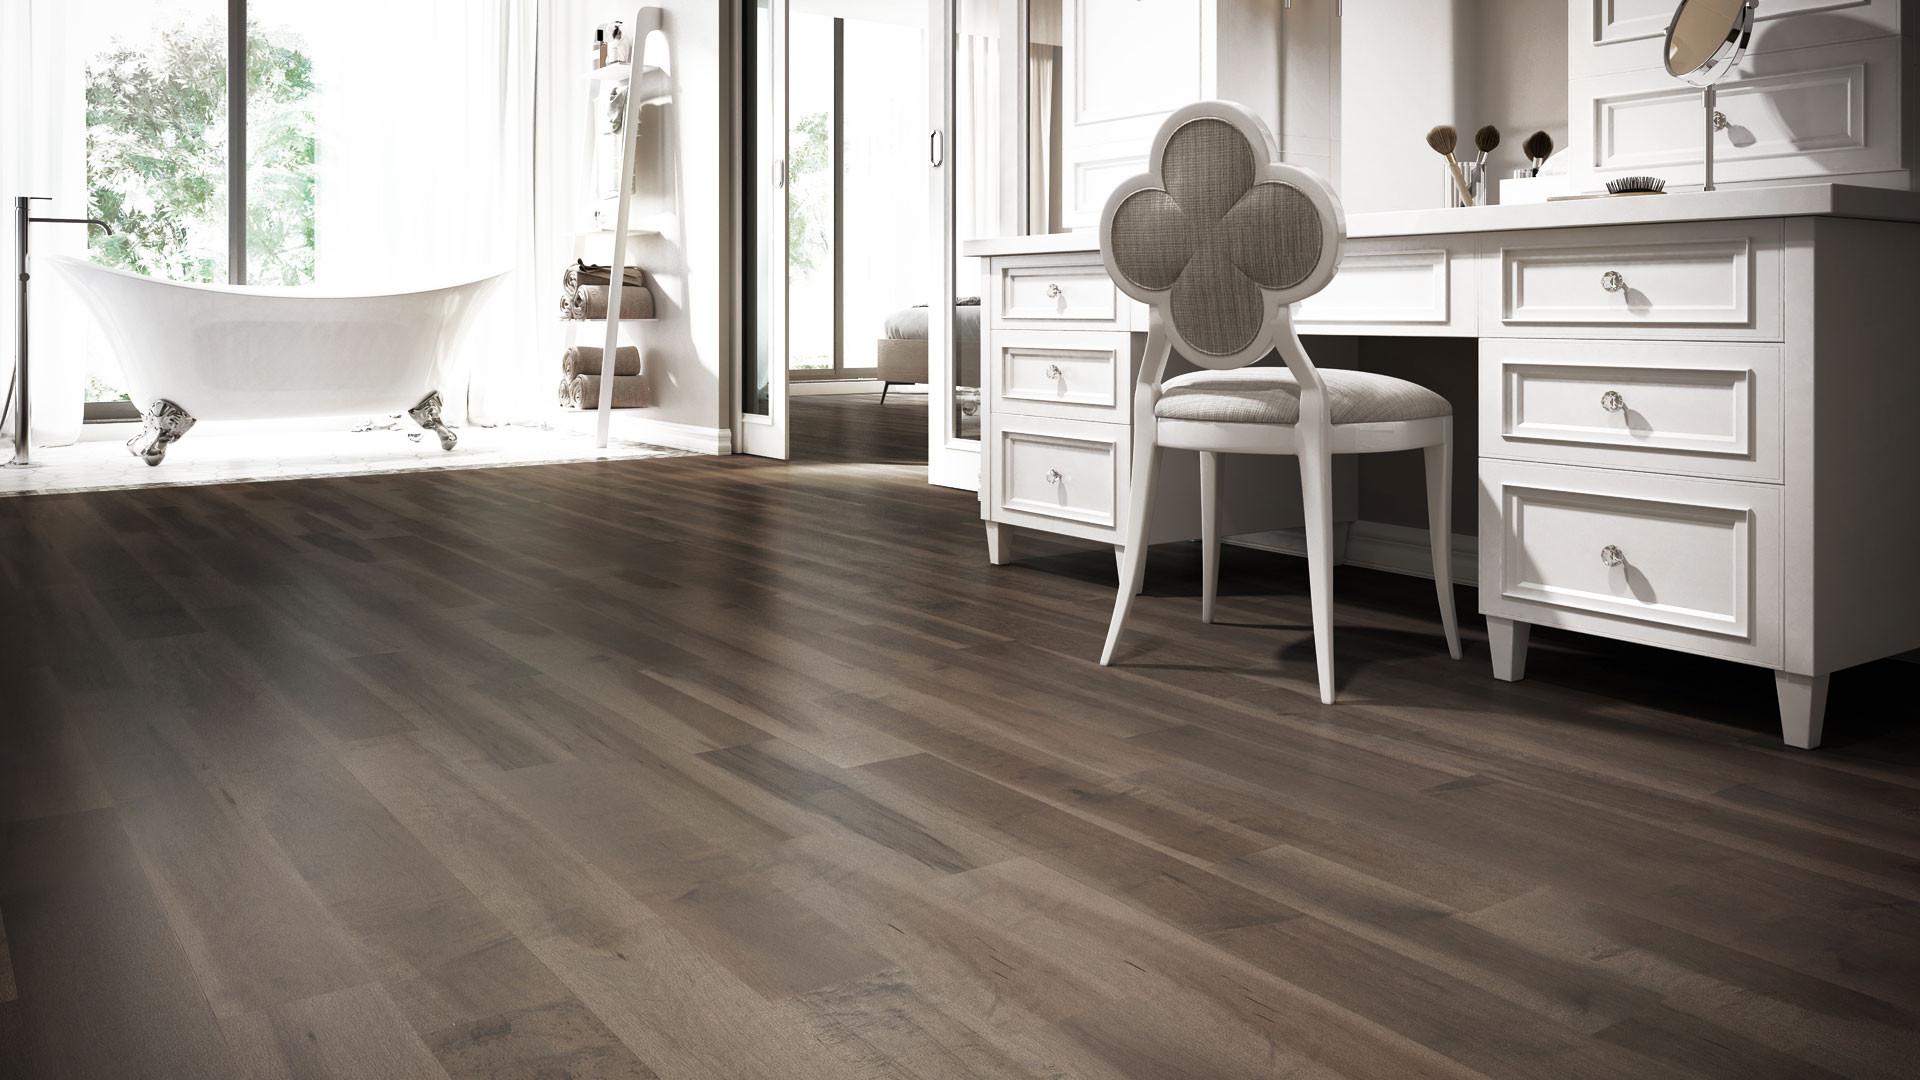 hardwood flooring trends for 2017 of 4 latest hardwood flooring trends lauzon flooring regarding top 4 hardwood flooring trends